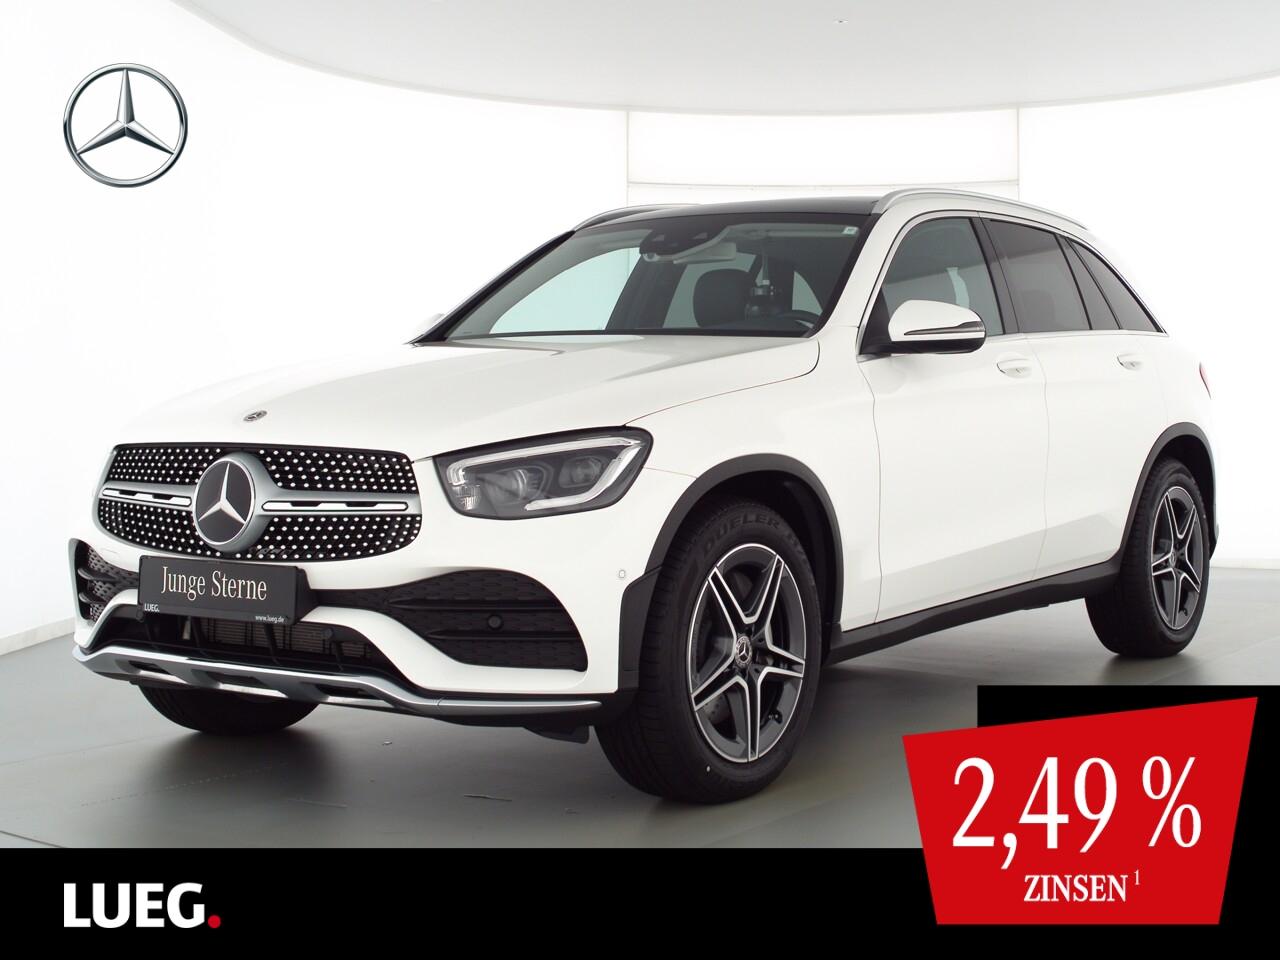 Mercedes-Benz GLC 200 4M AMG+MBUX+Nav+Pano+Mbeam+Sthzg+HUD+RFK, Jahr 2020, Benzin